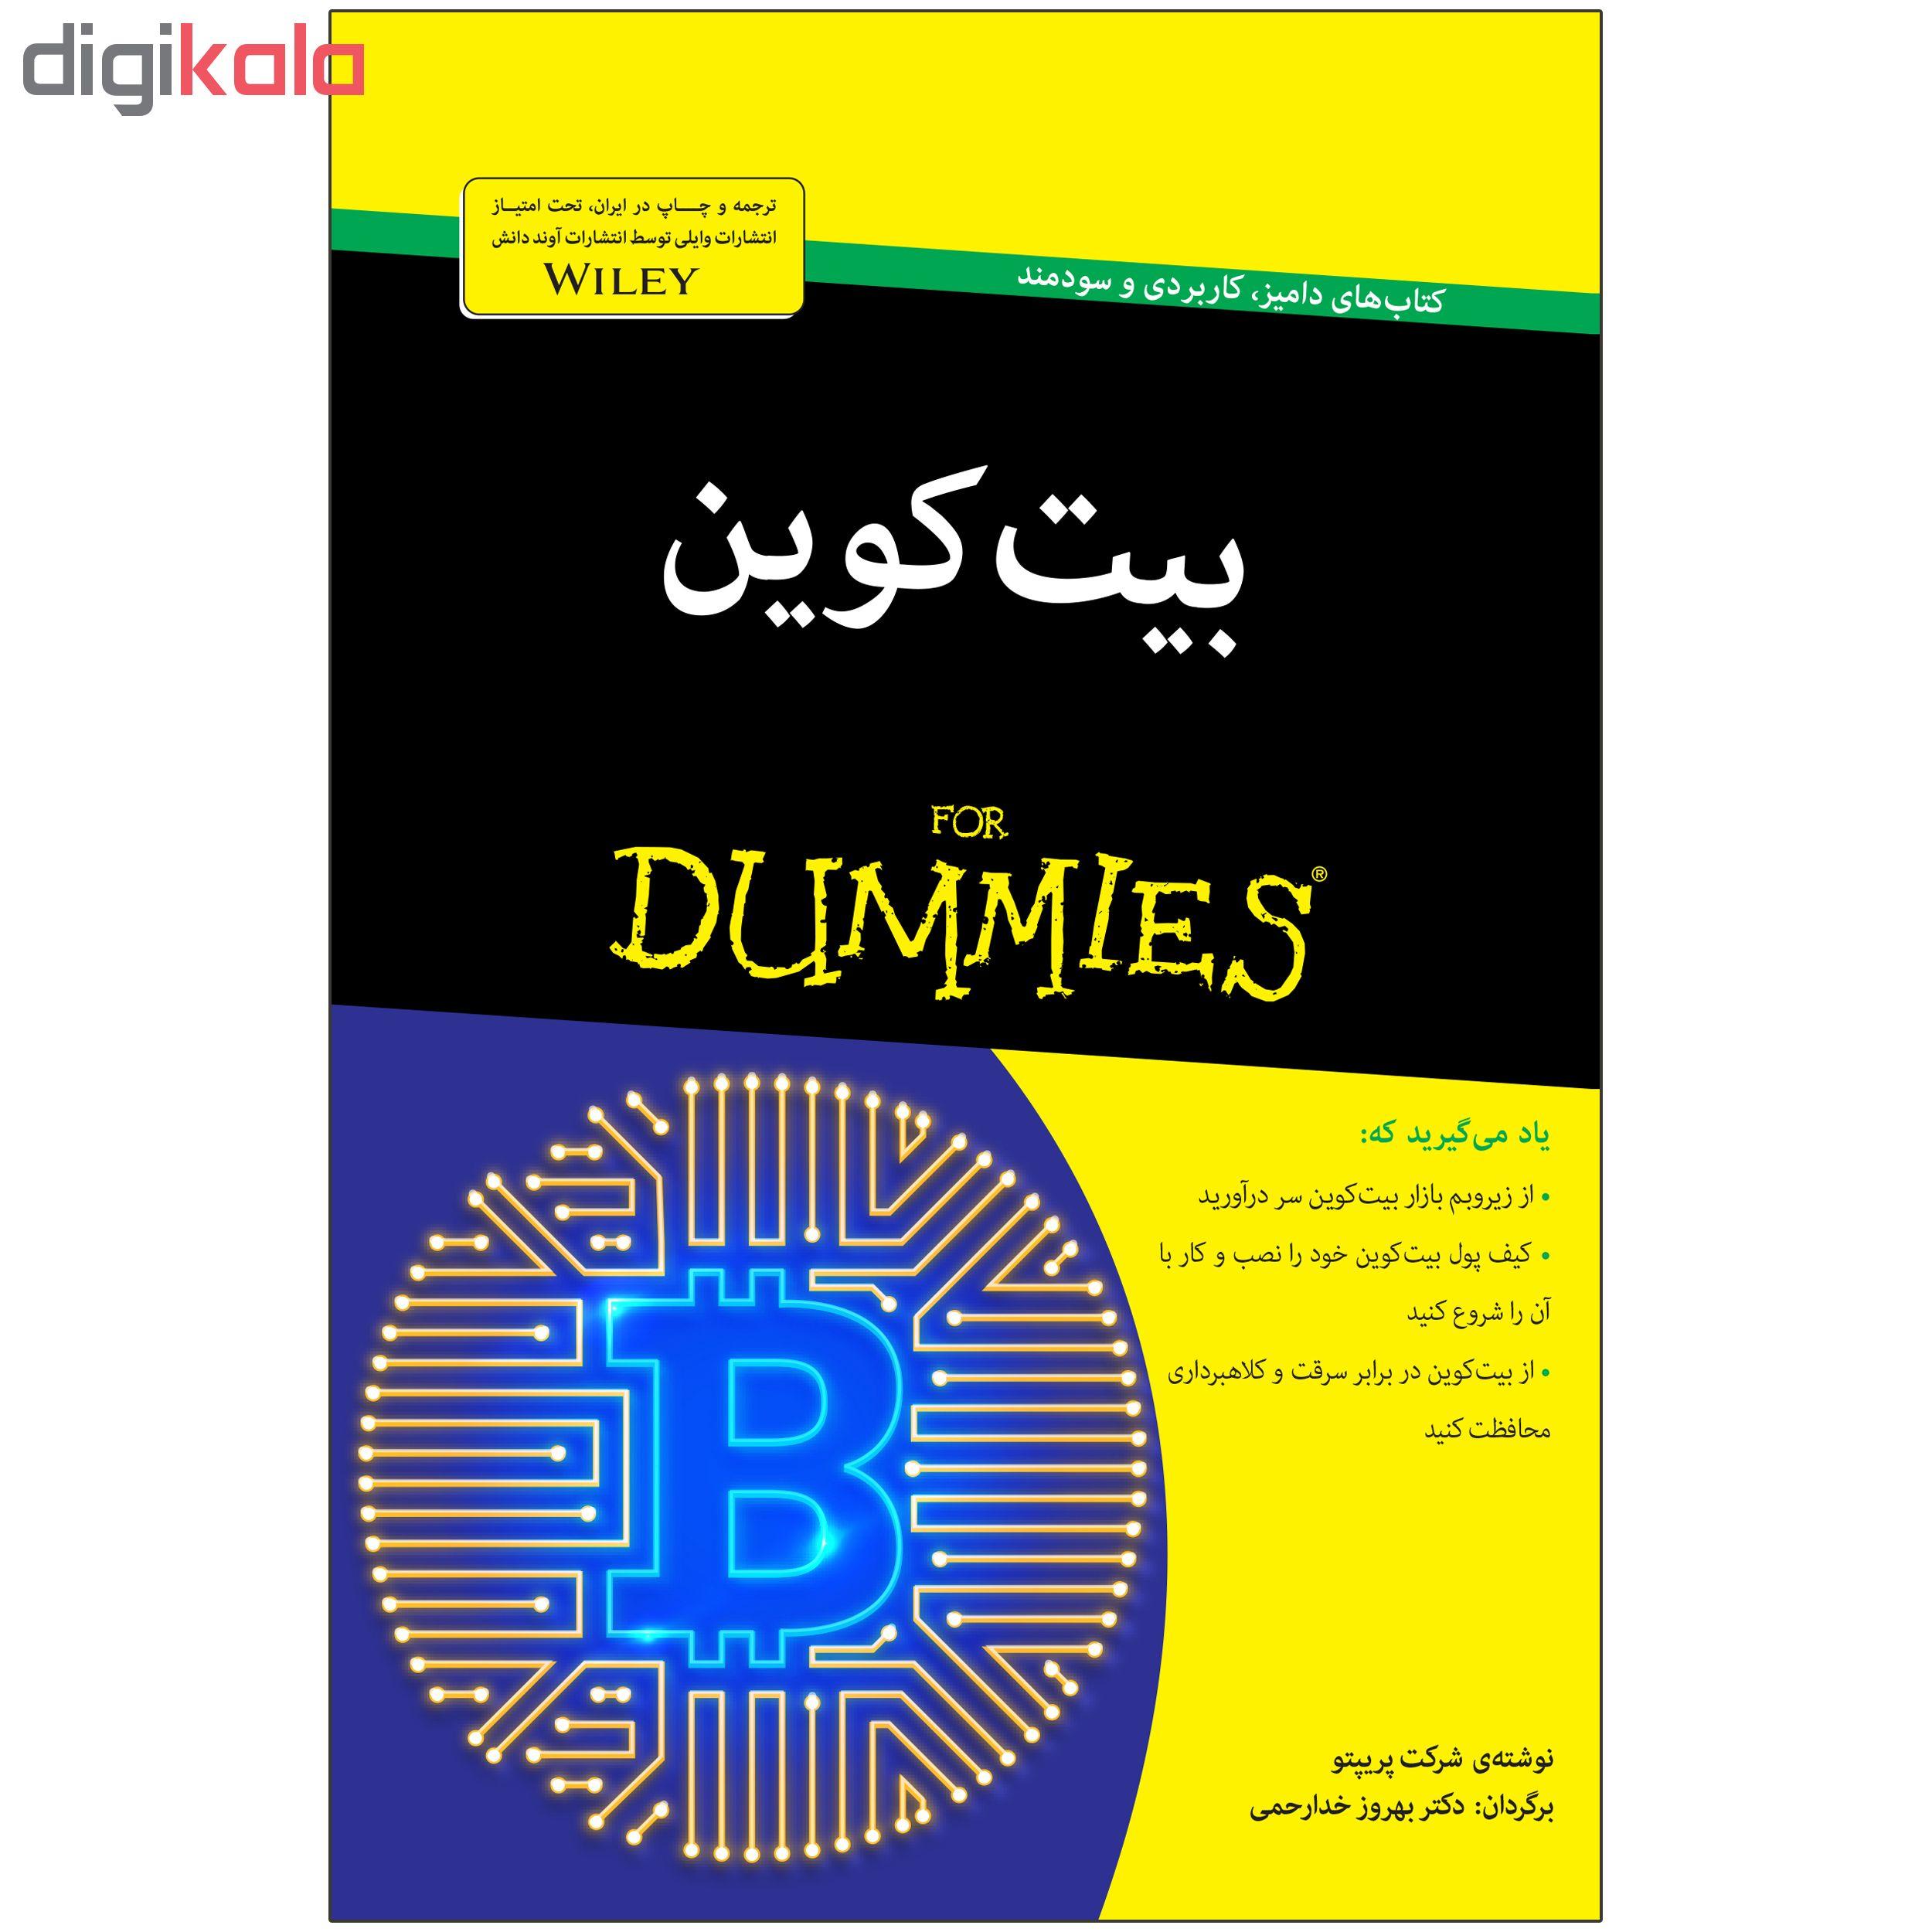 کتاب بیت کوین دامیز اثر پریپتو main 1 1